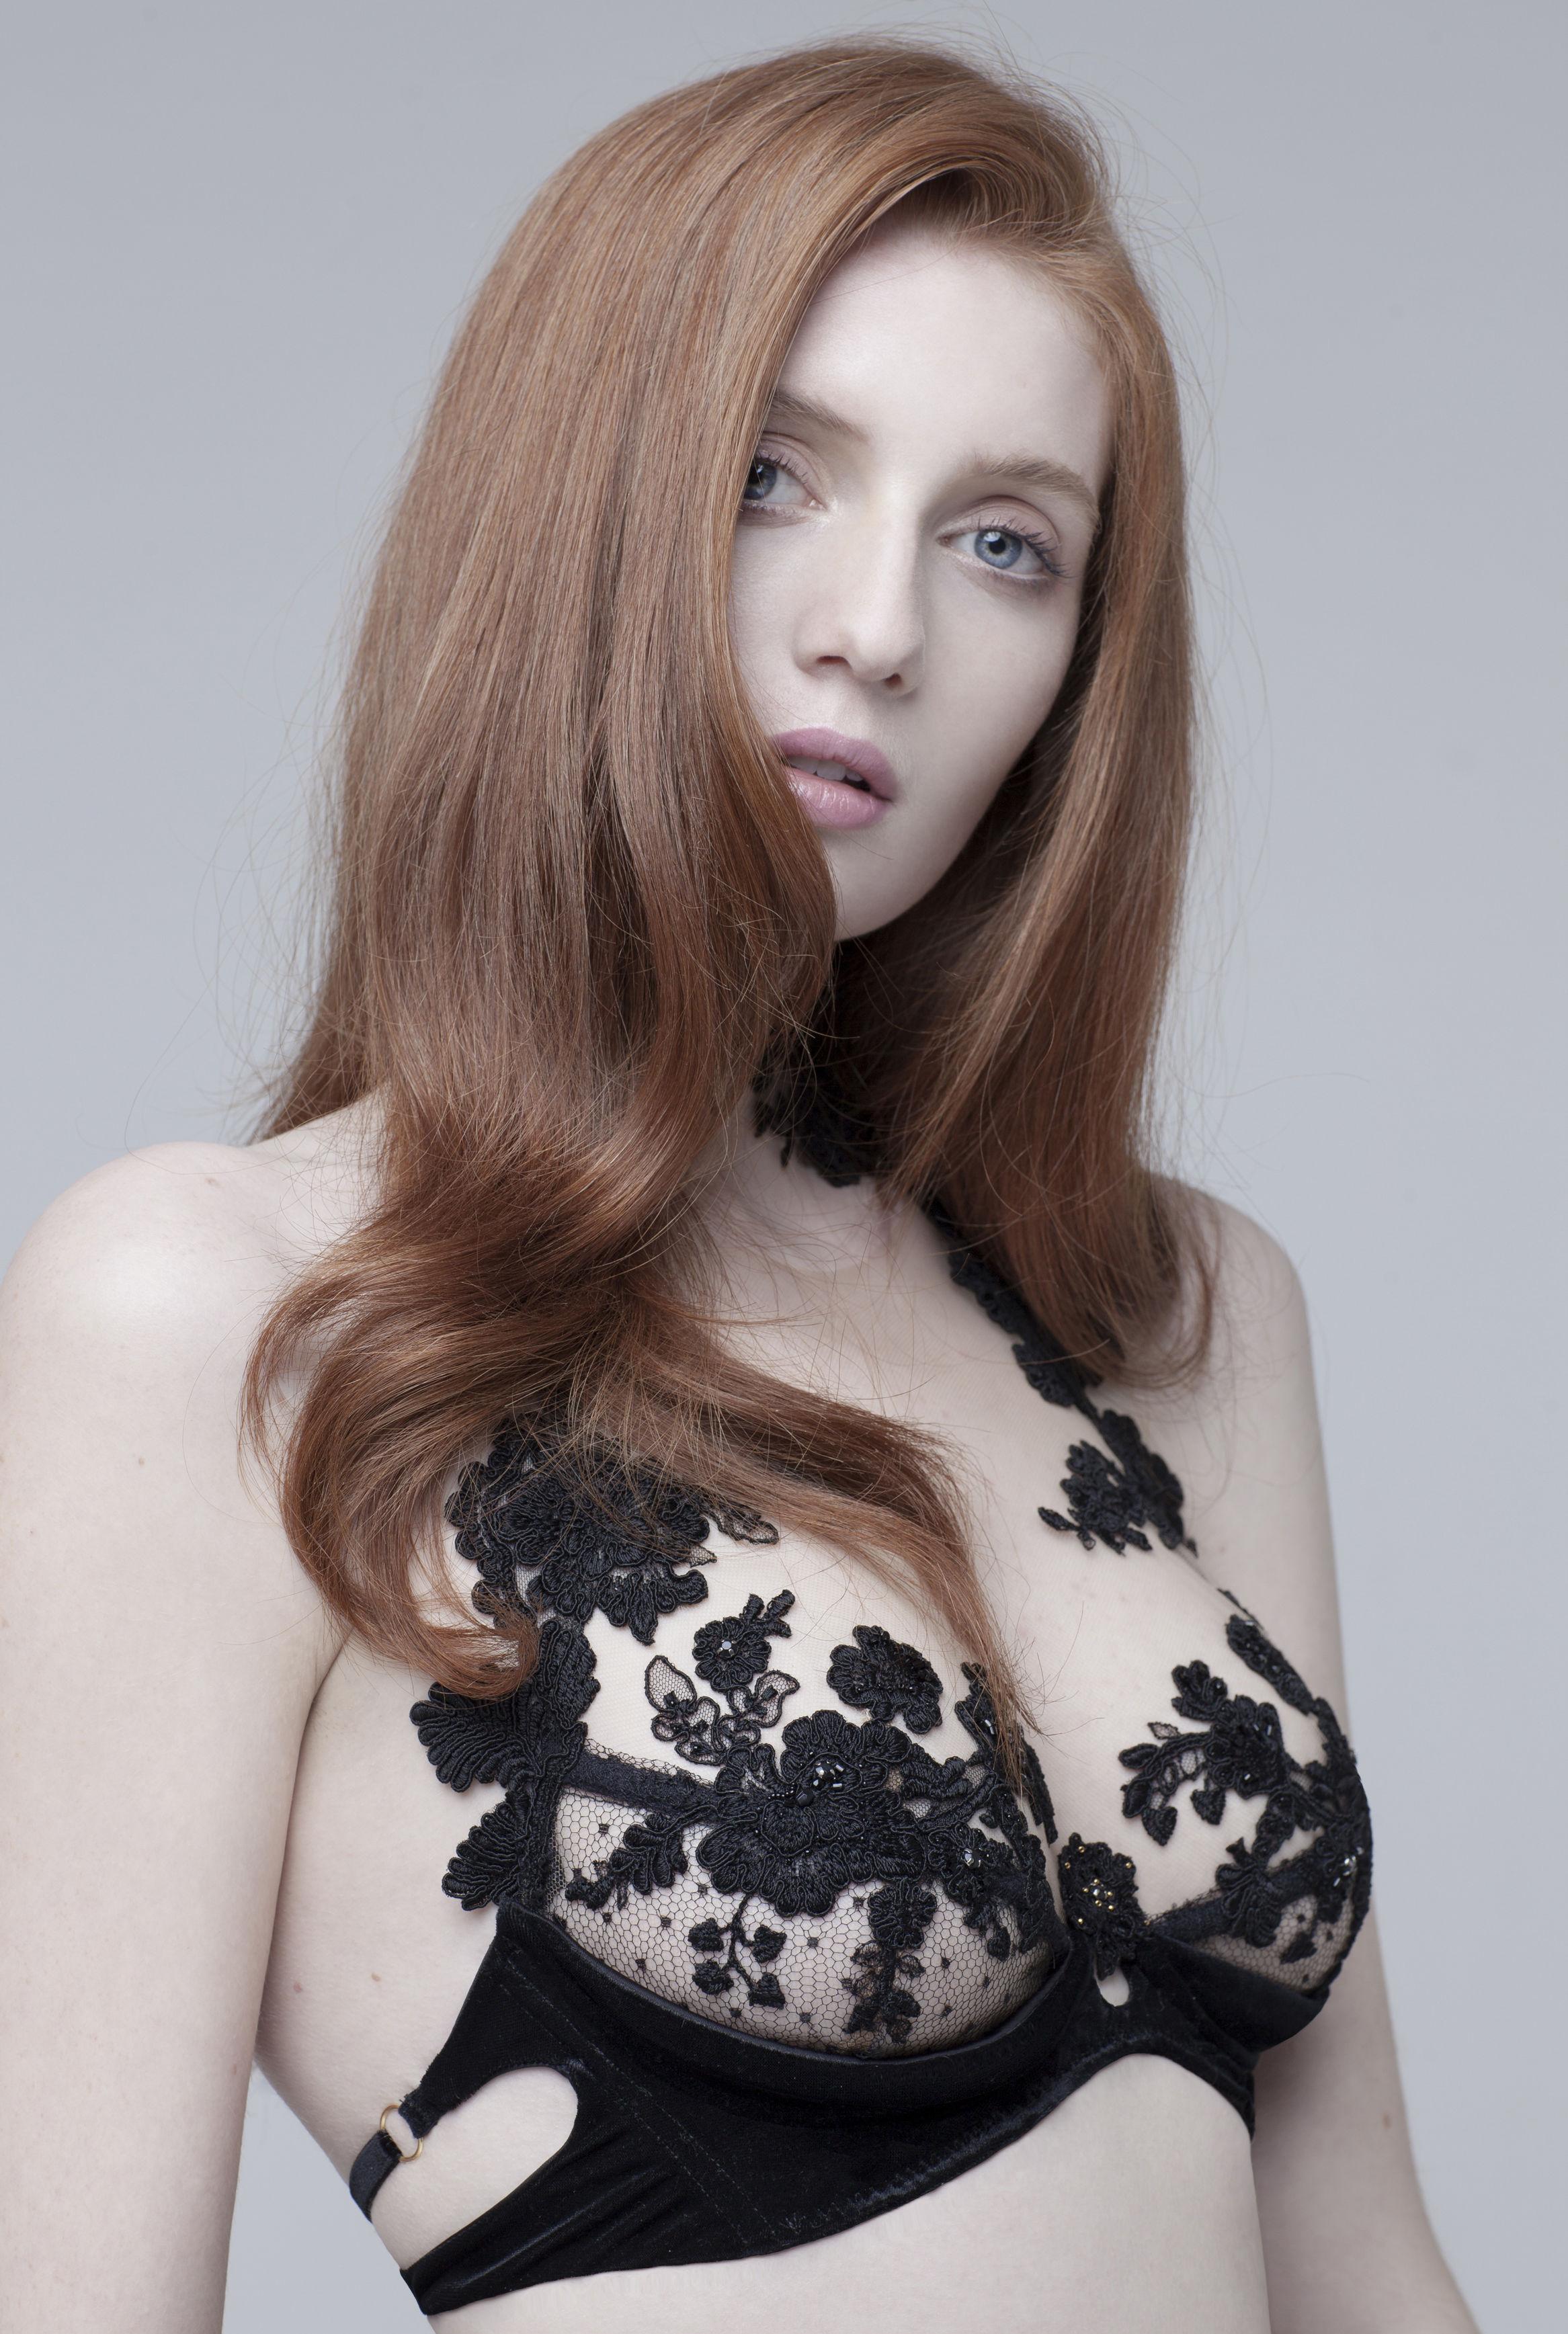 Kate Sykes